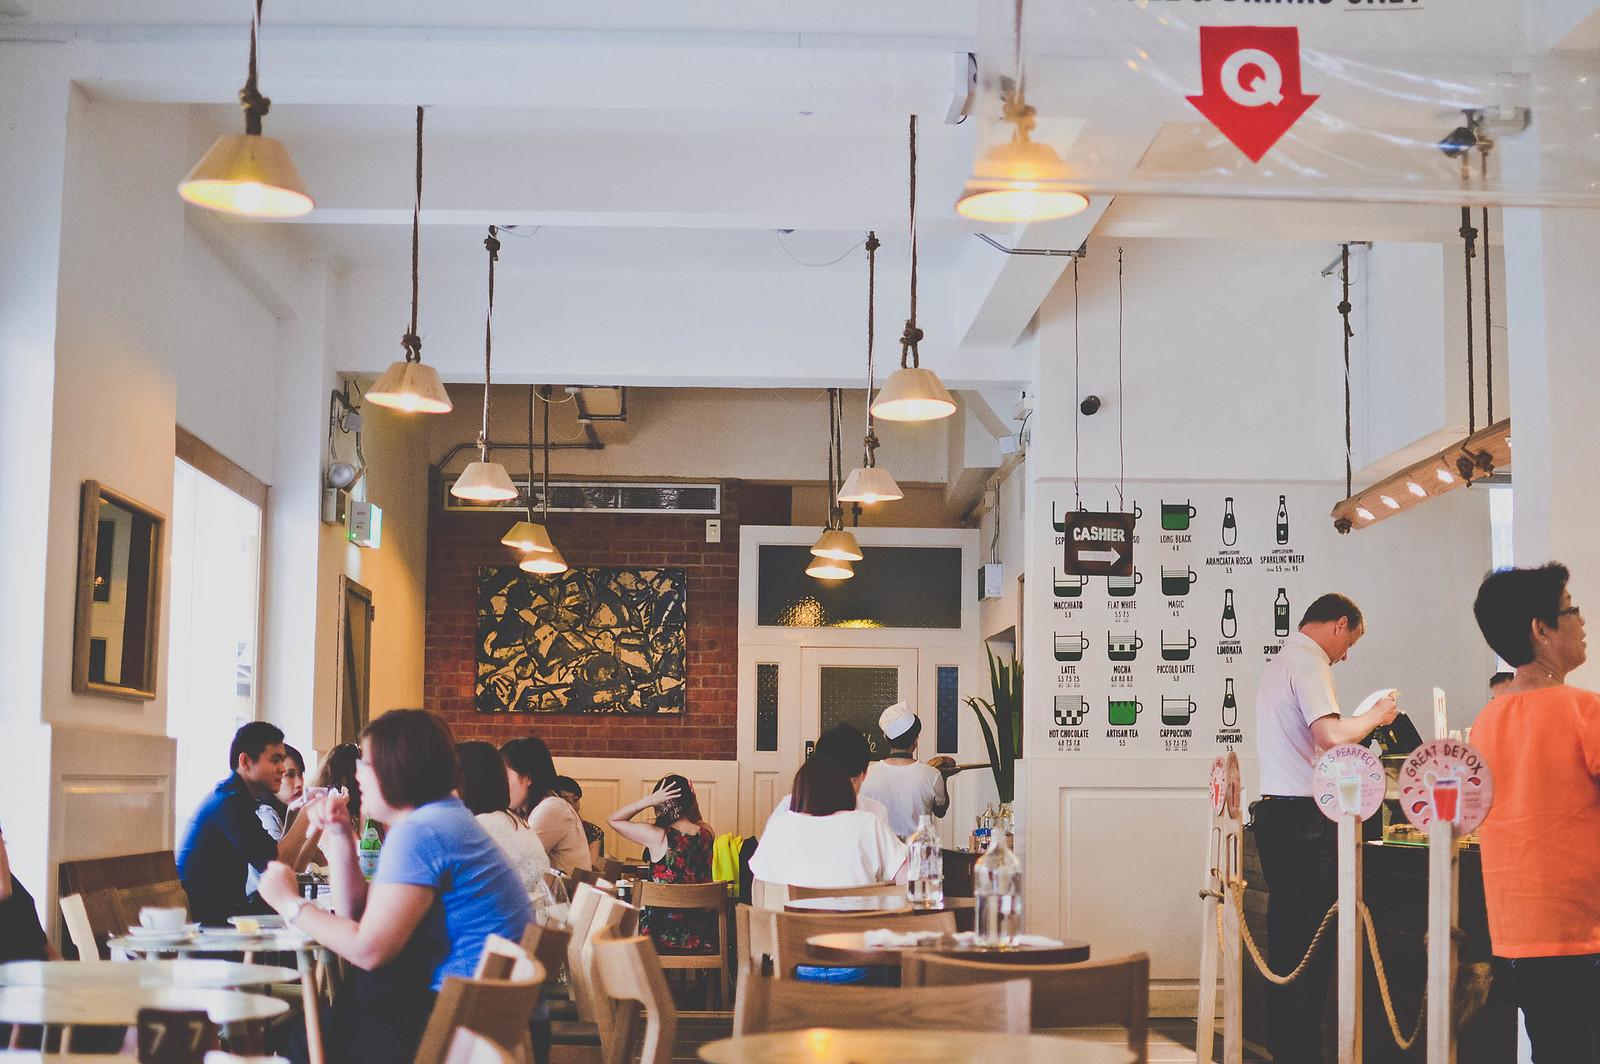 Tiong Bahru Bakery along Eng Hoon Street